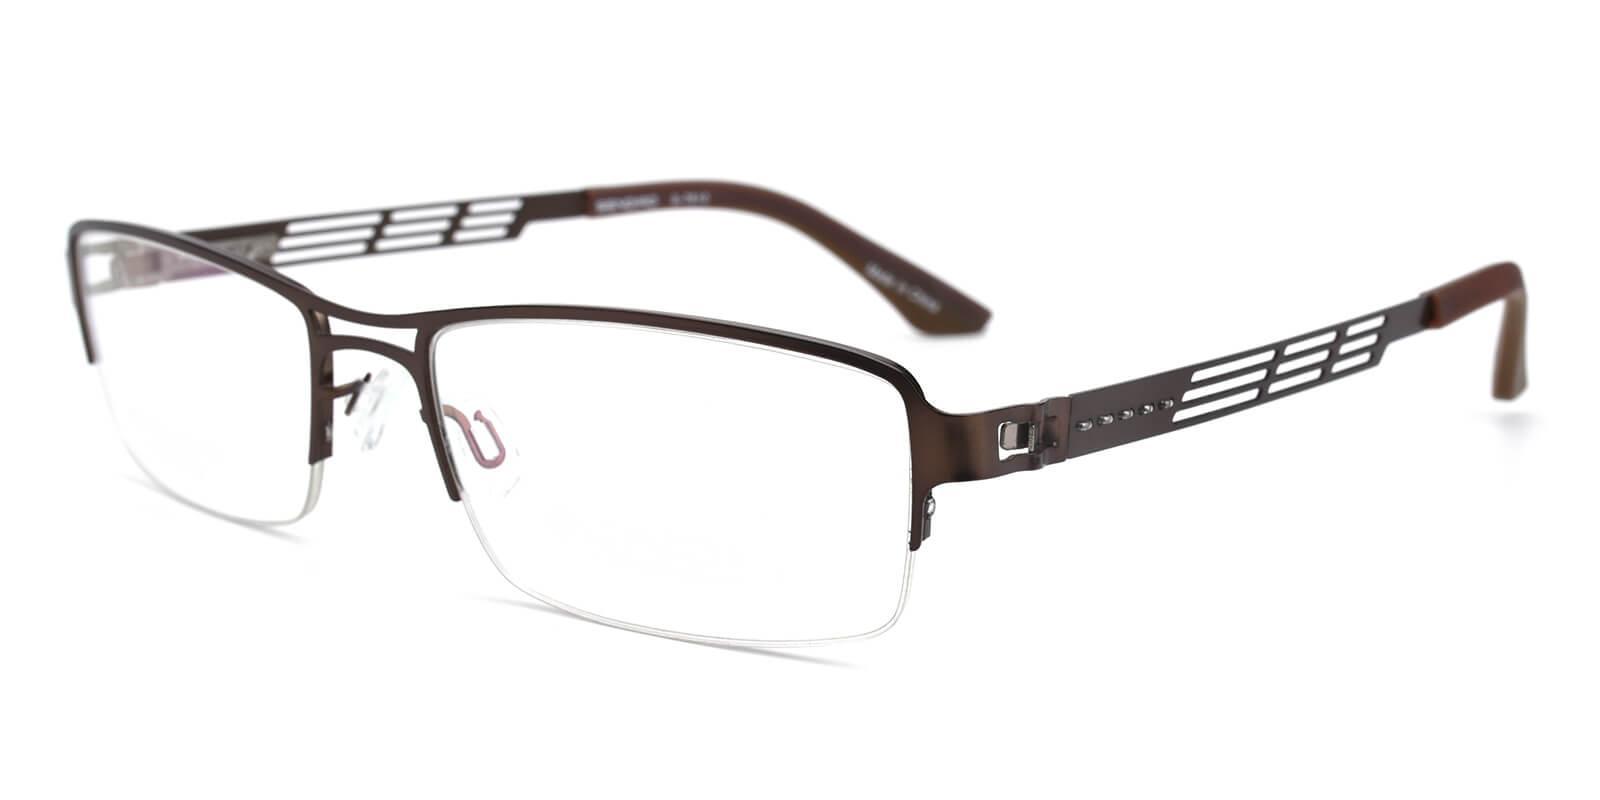 Carel-Brown-Rectangle-Metal-Eyeglasses-additional1